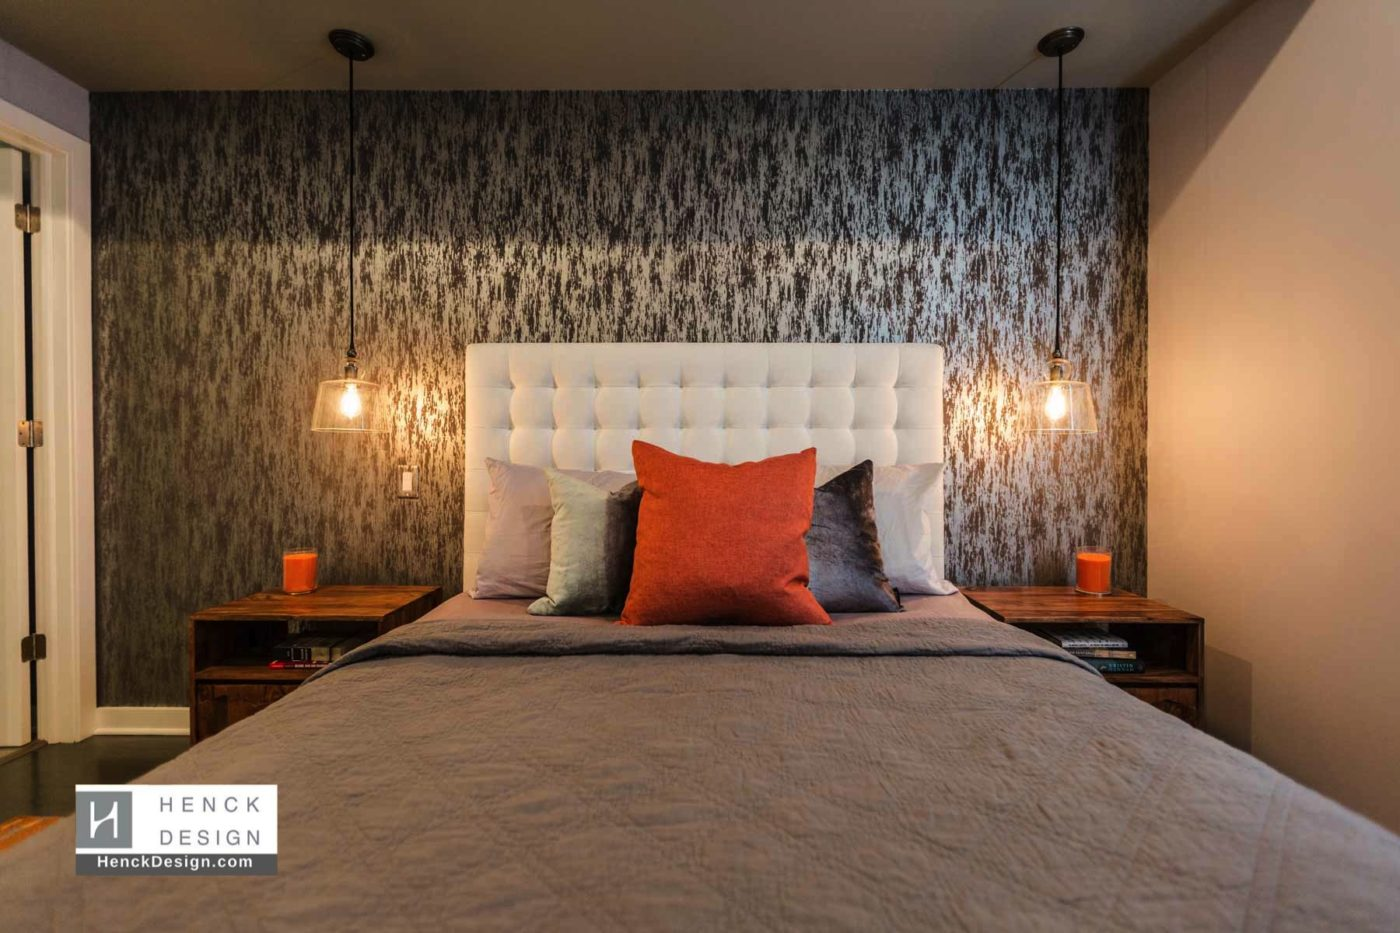 residential interior design in Philadelphia